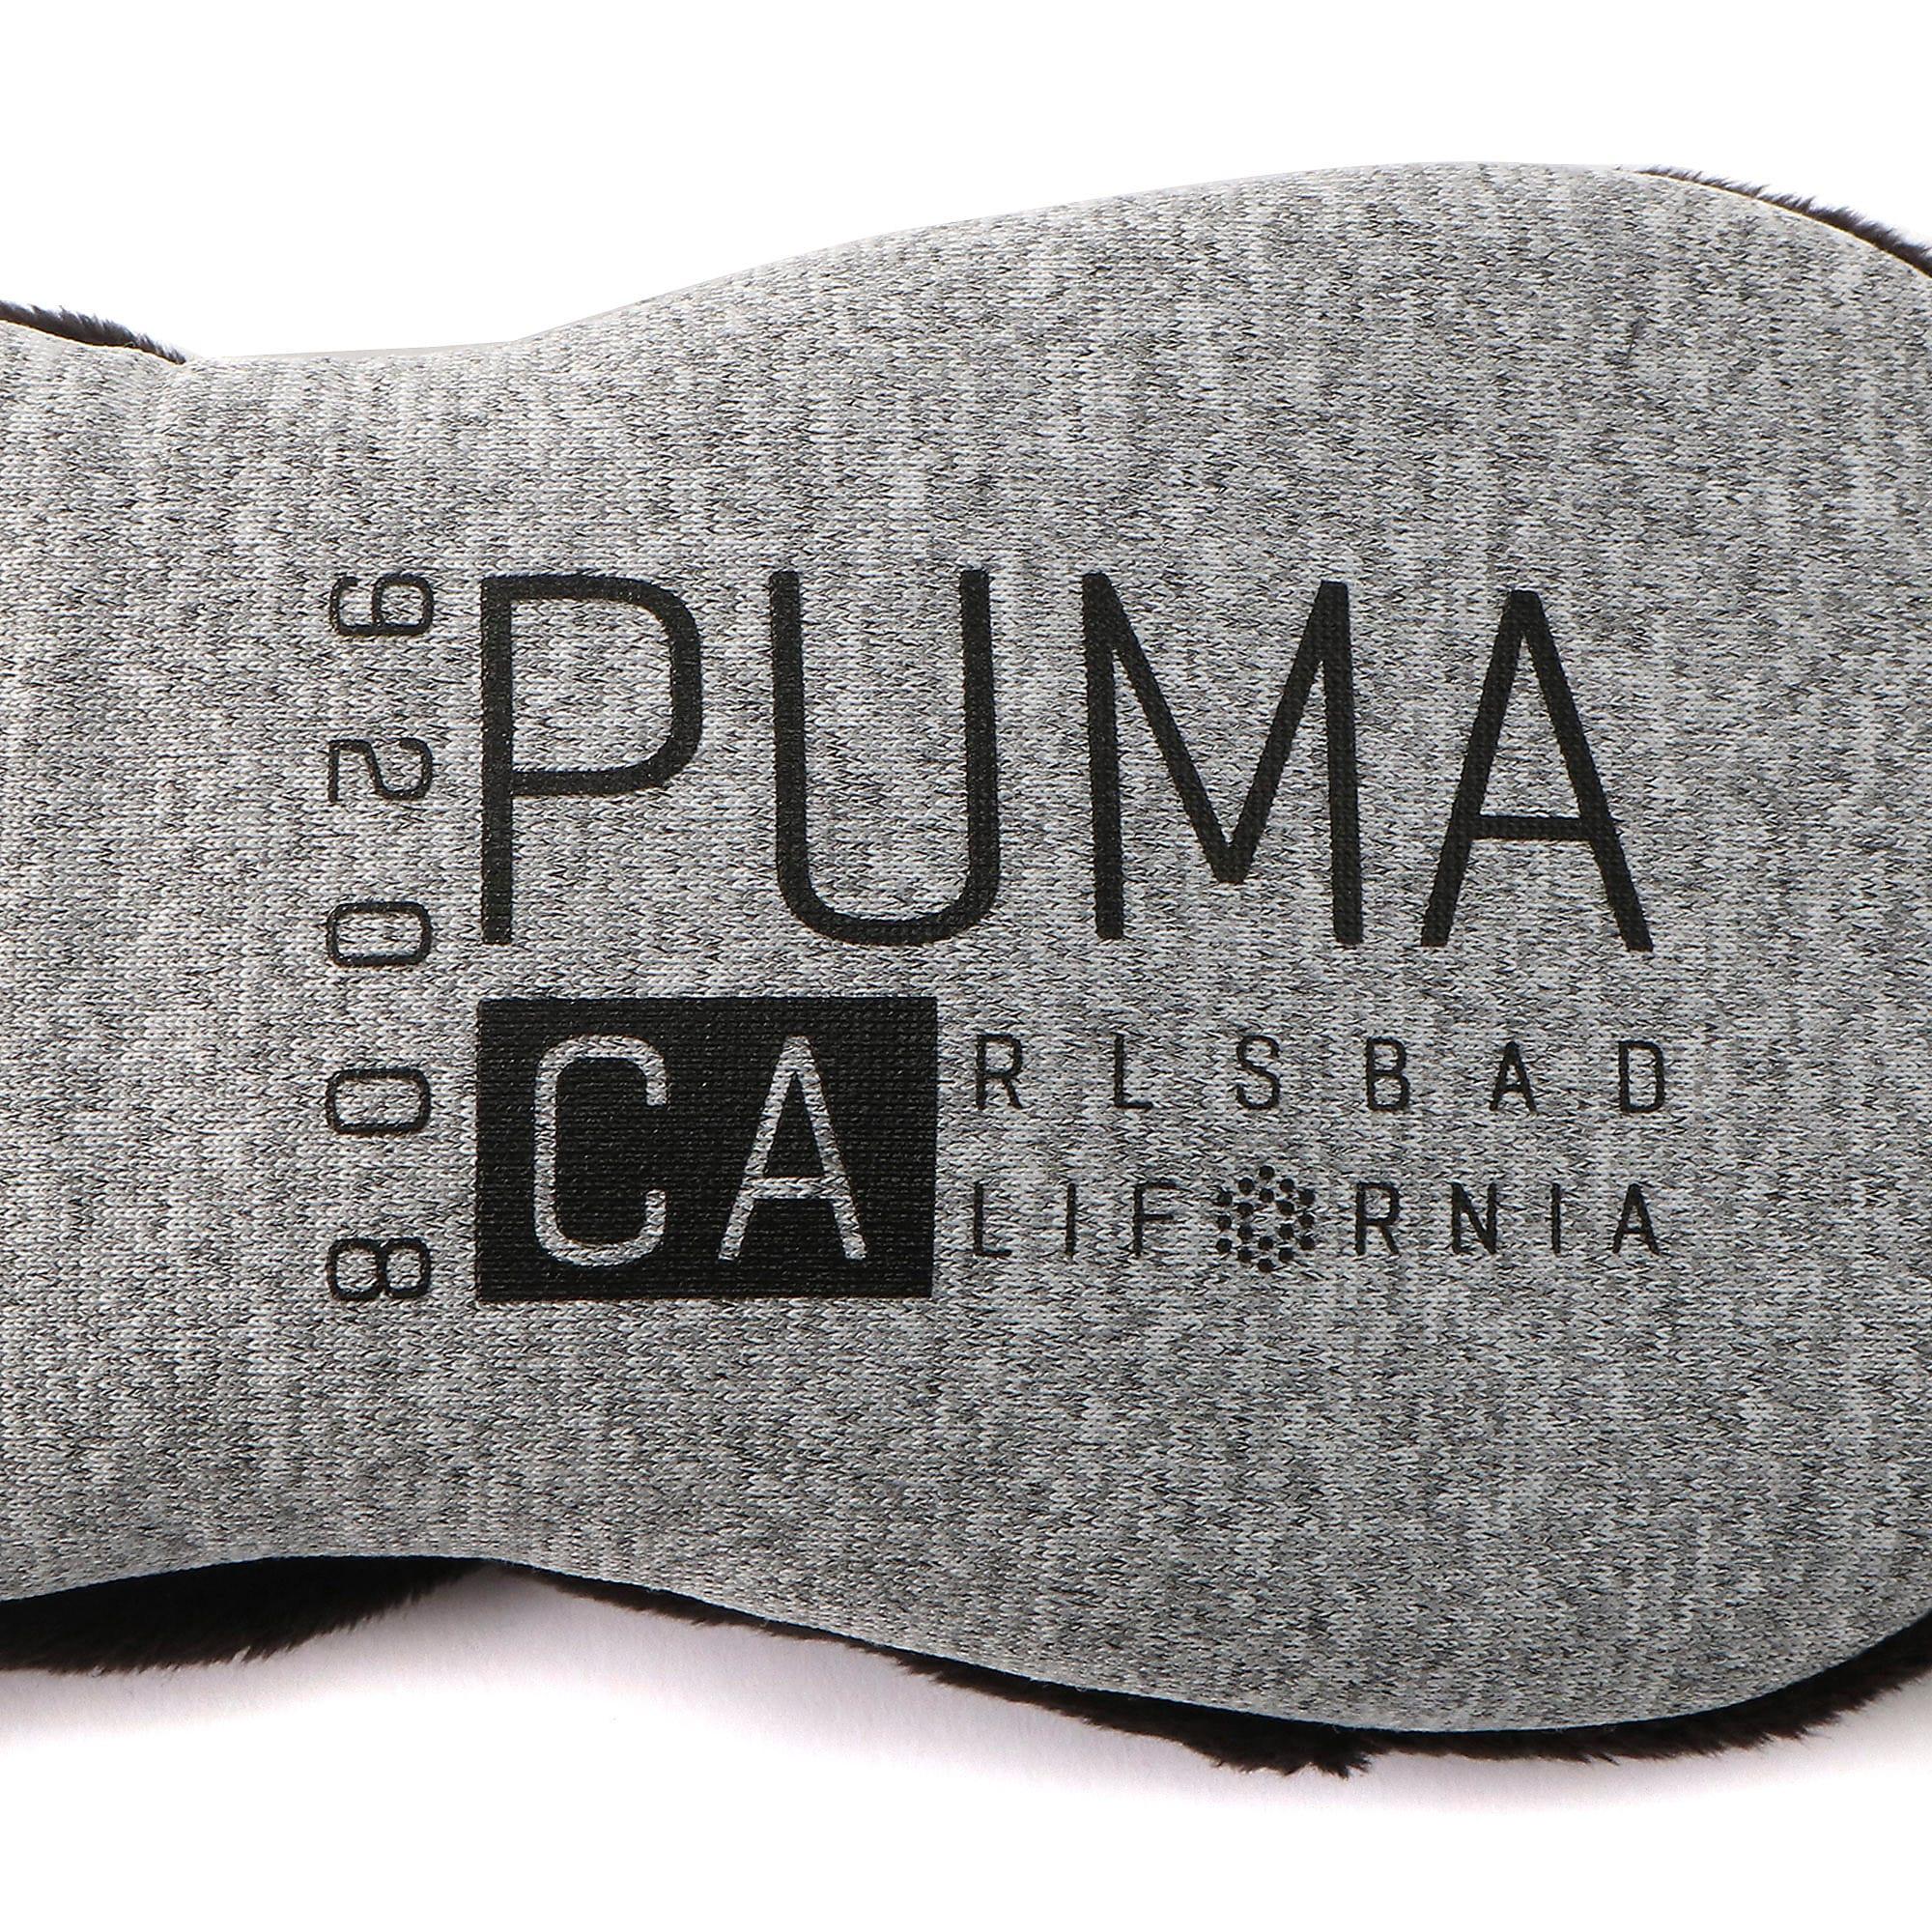 Thumbnail 4 of ゴルフ CA ヘッドカバー ユーティリティー, light gray heather, medium-JPN